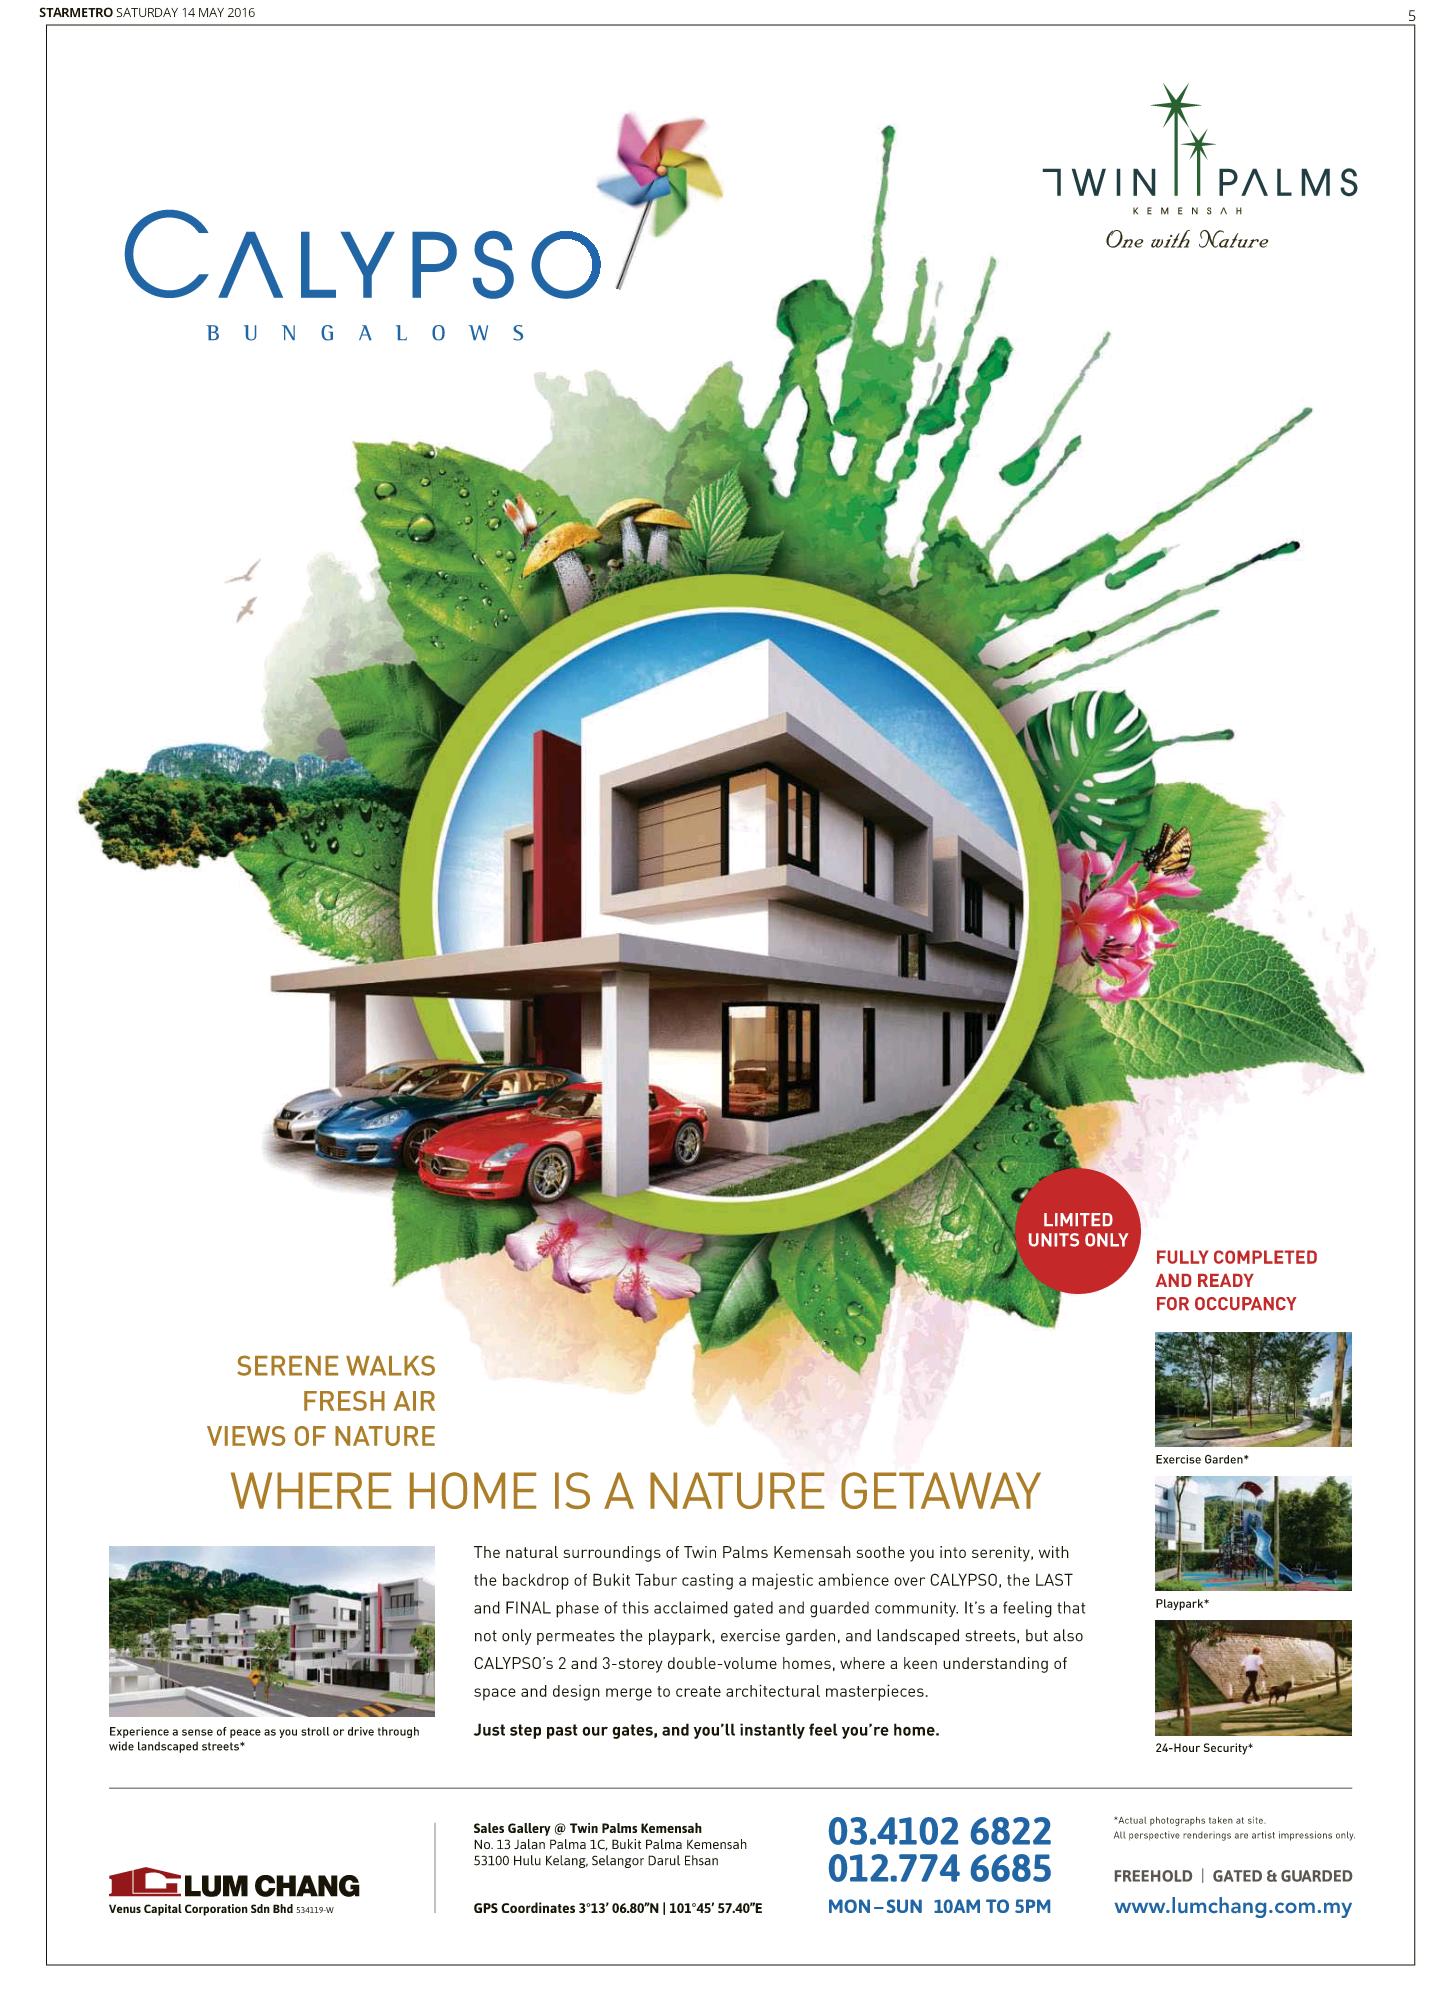 Calypso Twinpalms Brochure Design Advertising Design